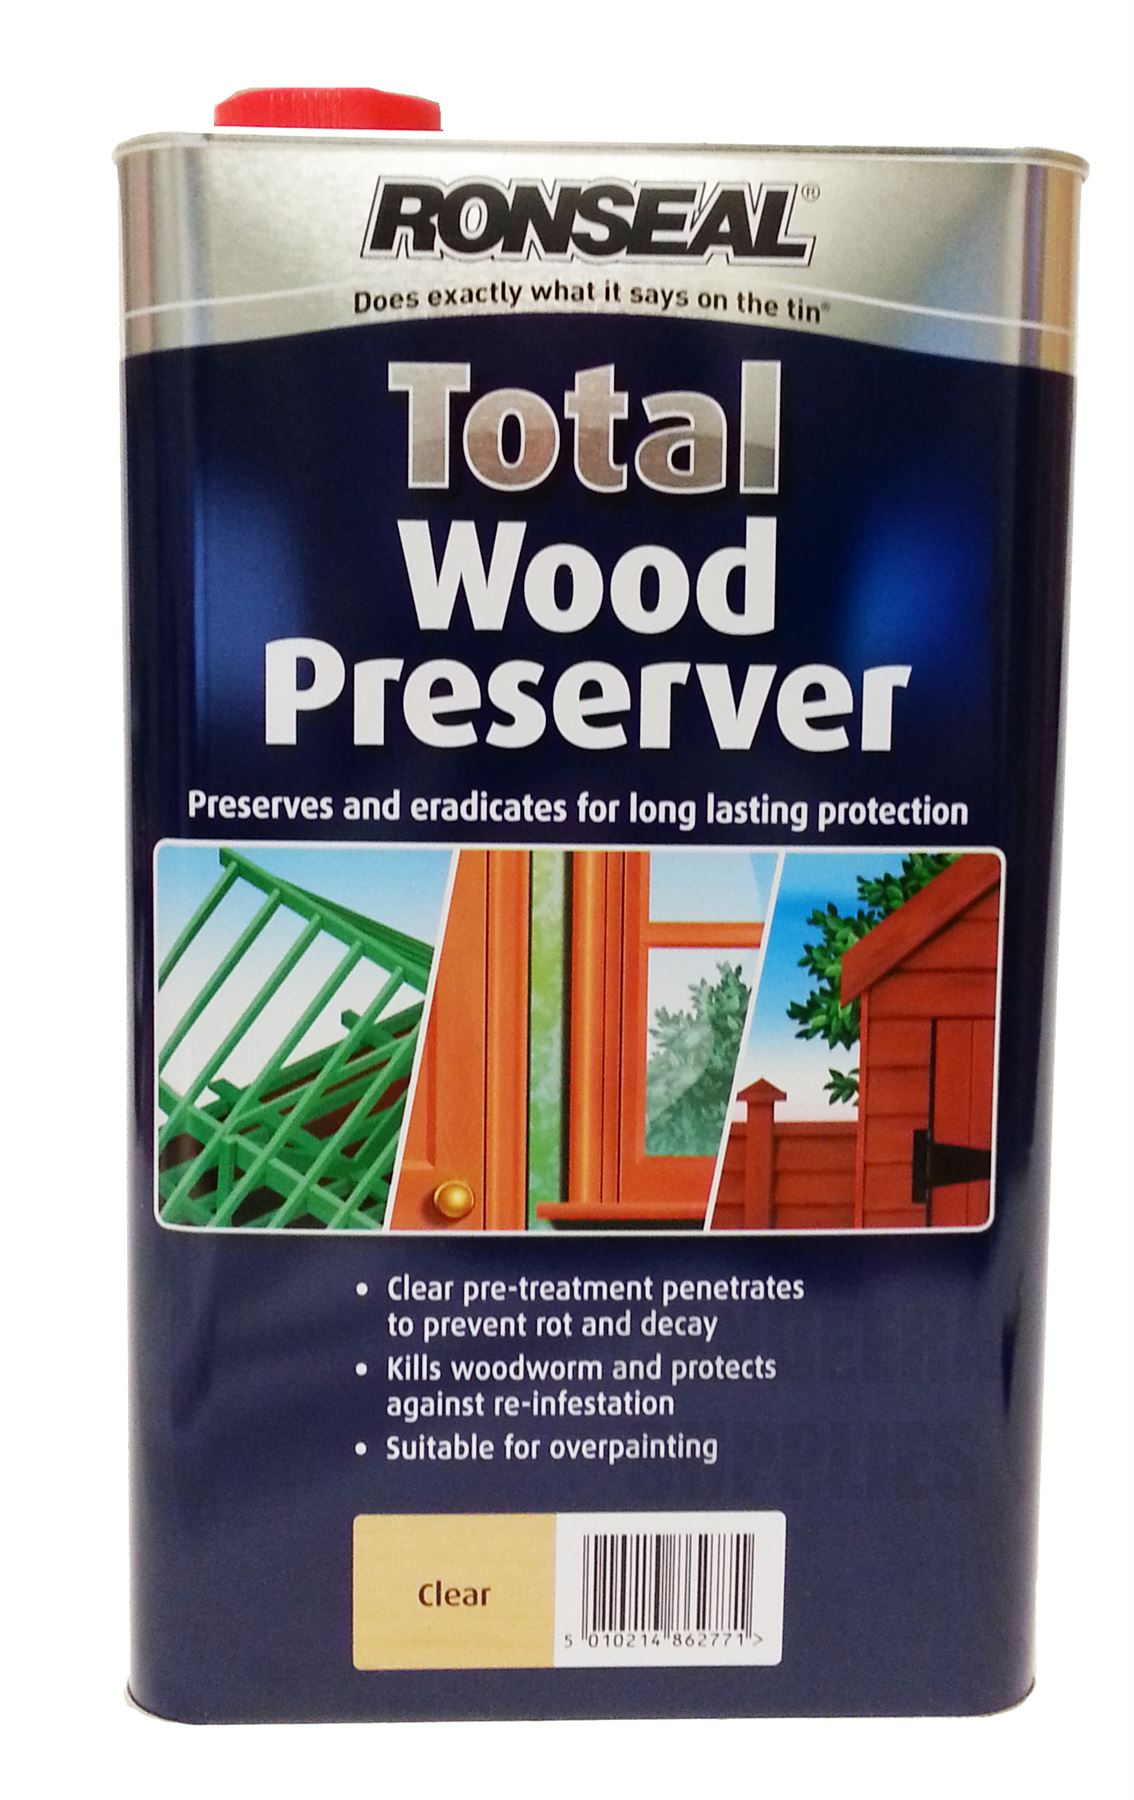 ronseal total wood preserver kills woodworm prevents rot. Black Bedroom Furniture Sets. Home Design Ideas